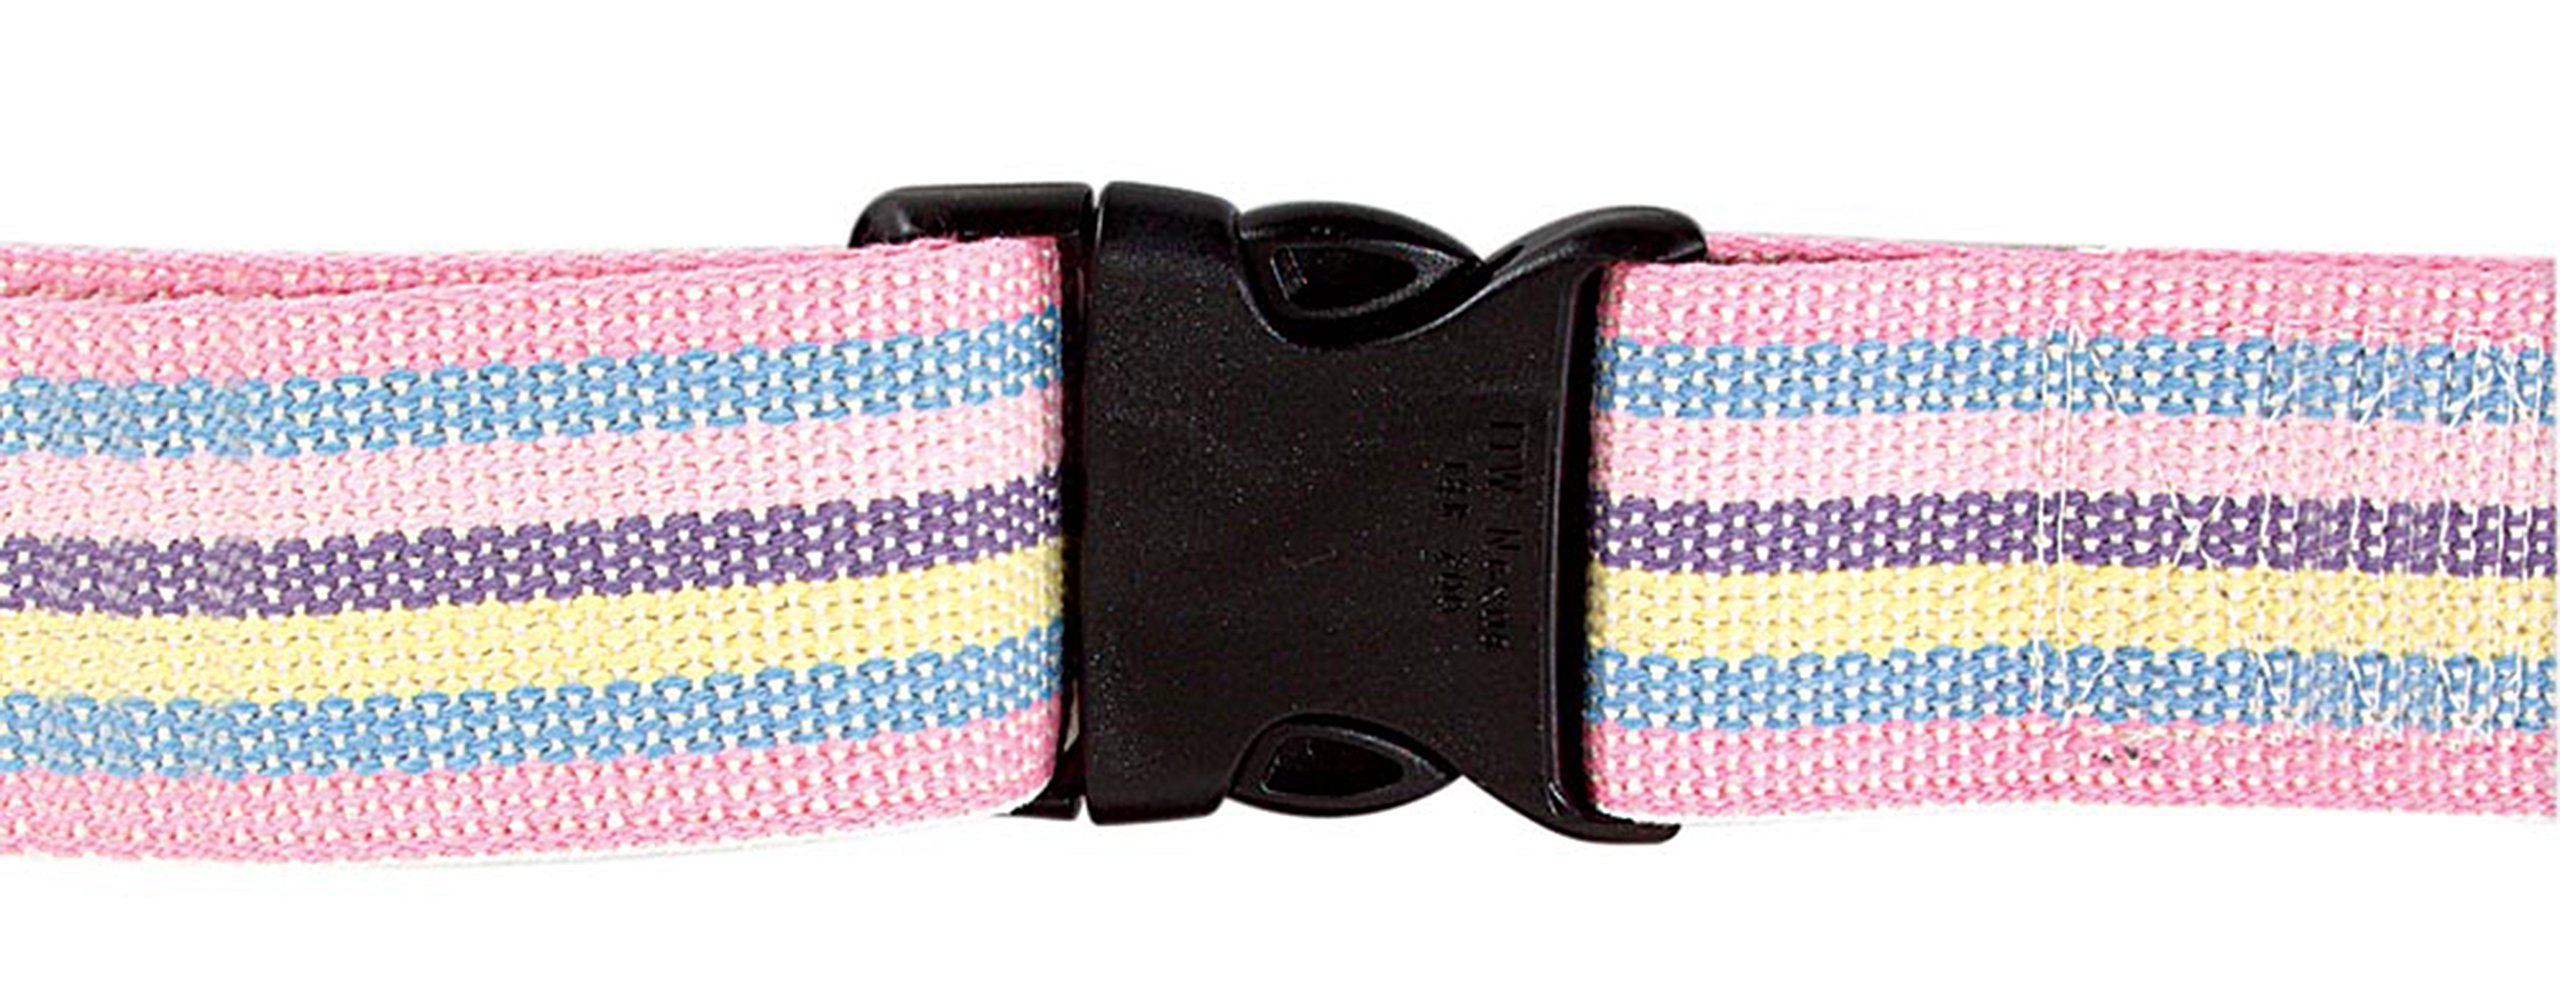 AliMed Gait Belt - Pastel with Plastic Buckle, 40'', 5/pk